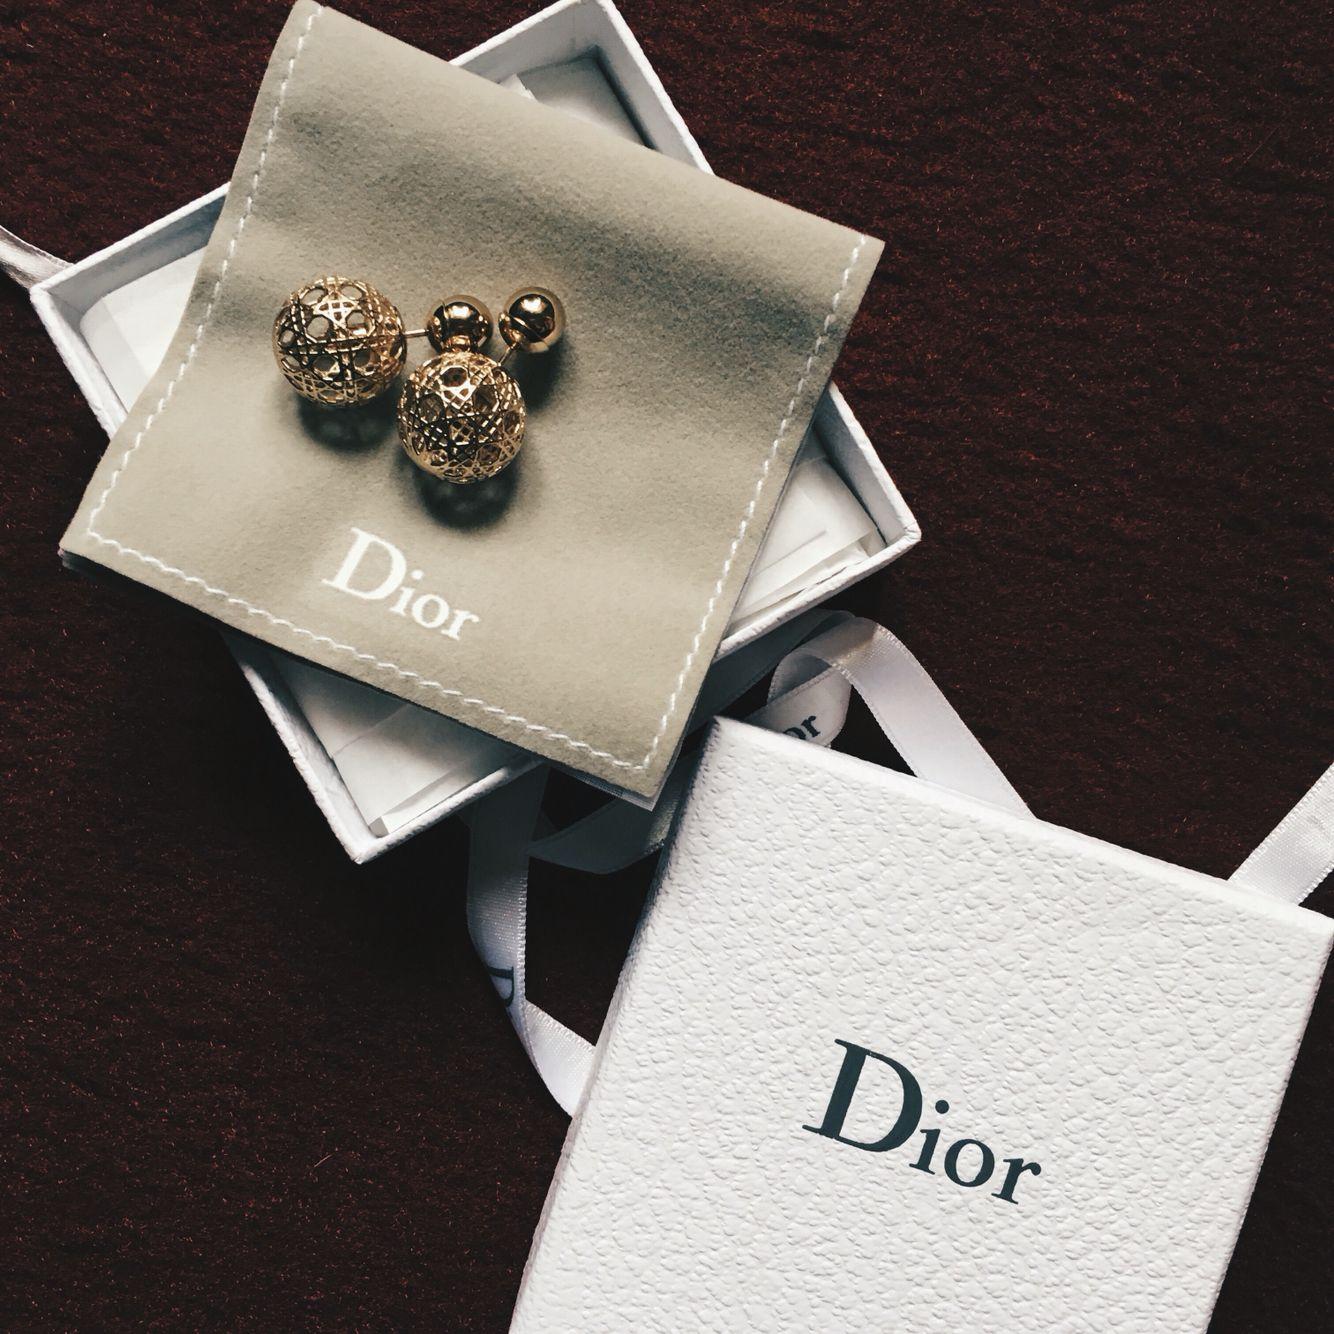 Dior triable earrings